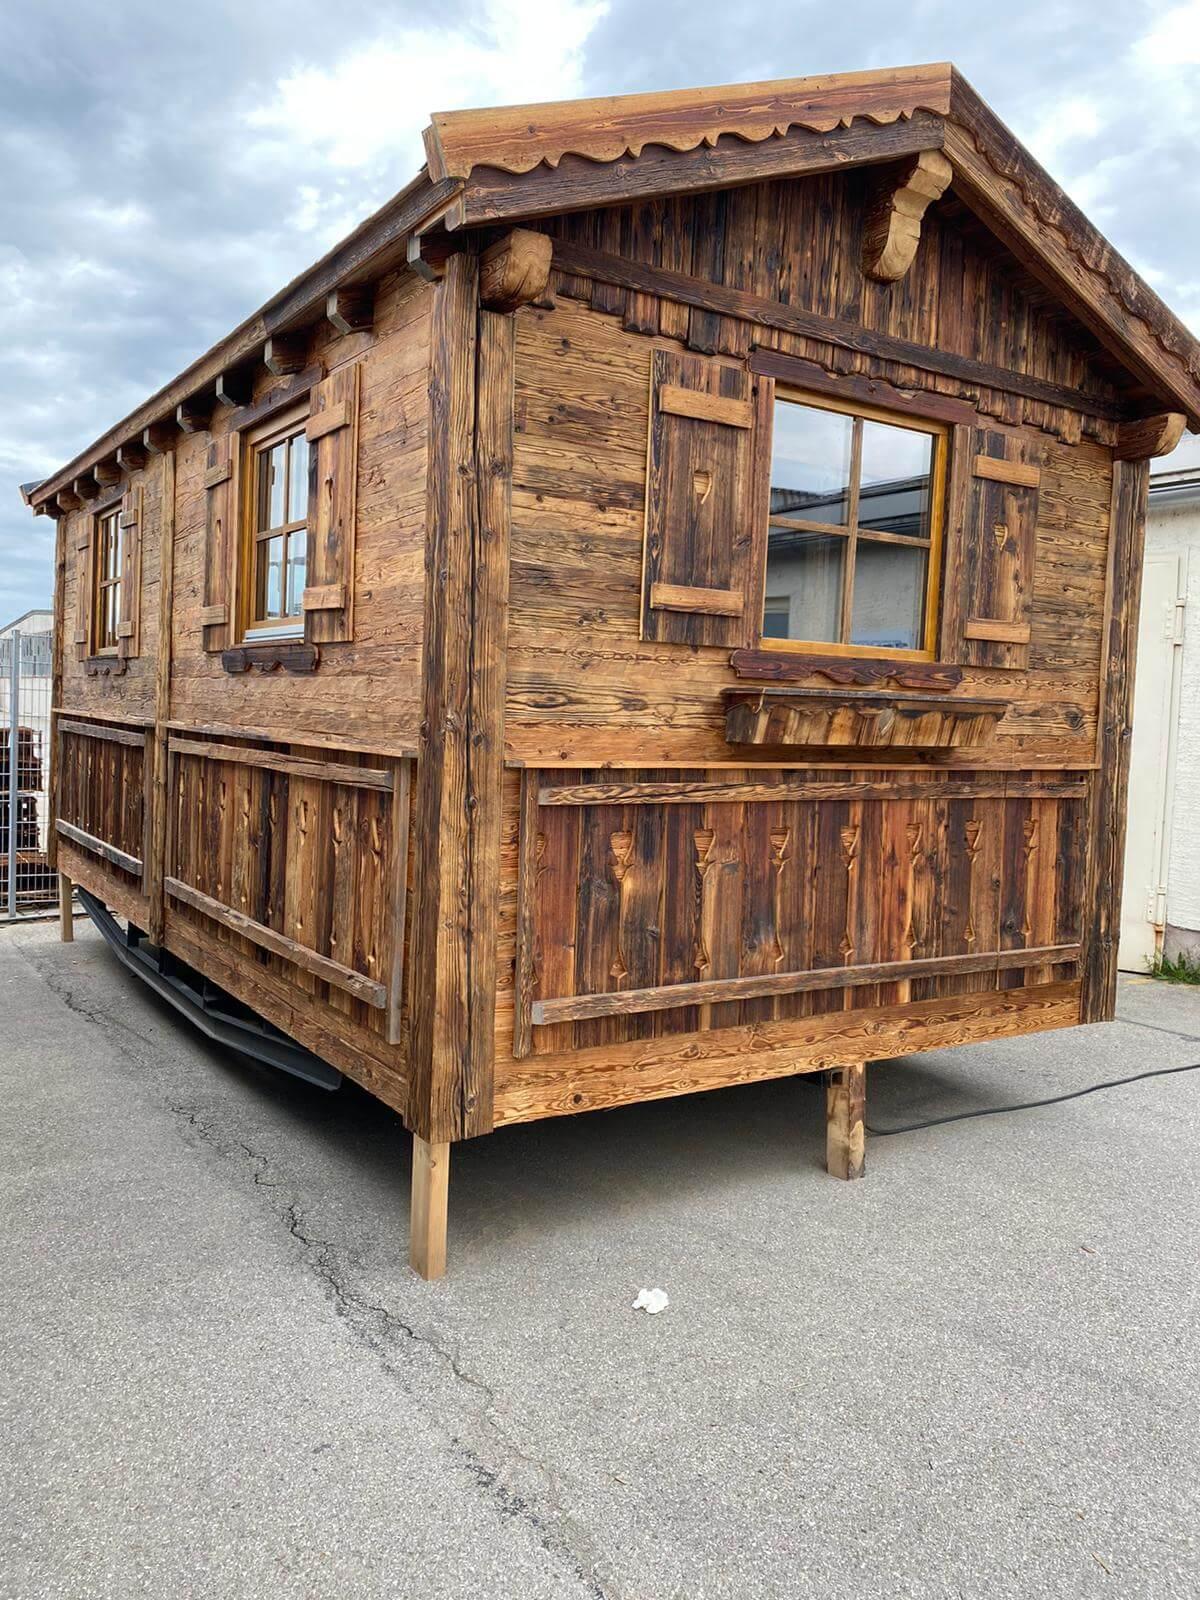 mobiles-chalet-almhuette-vital-camp-gmbh01